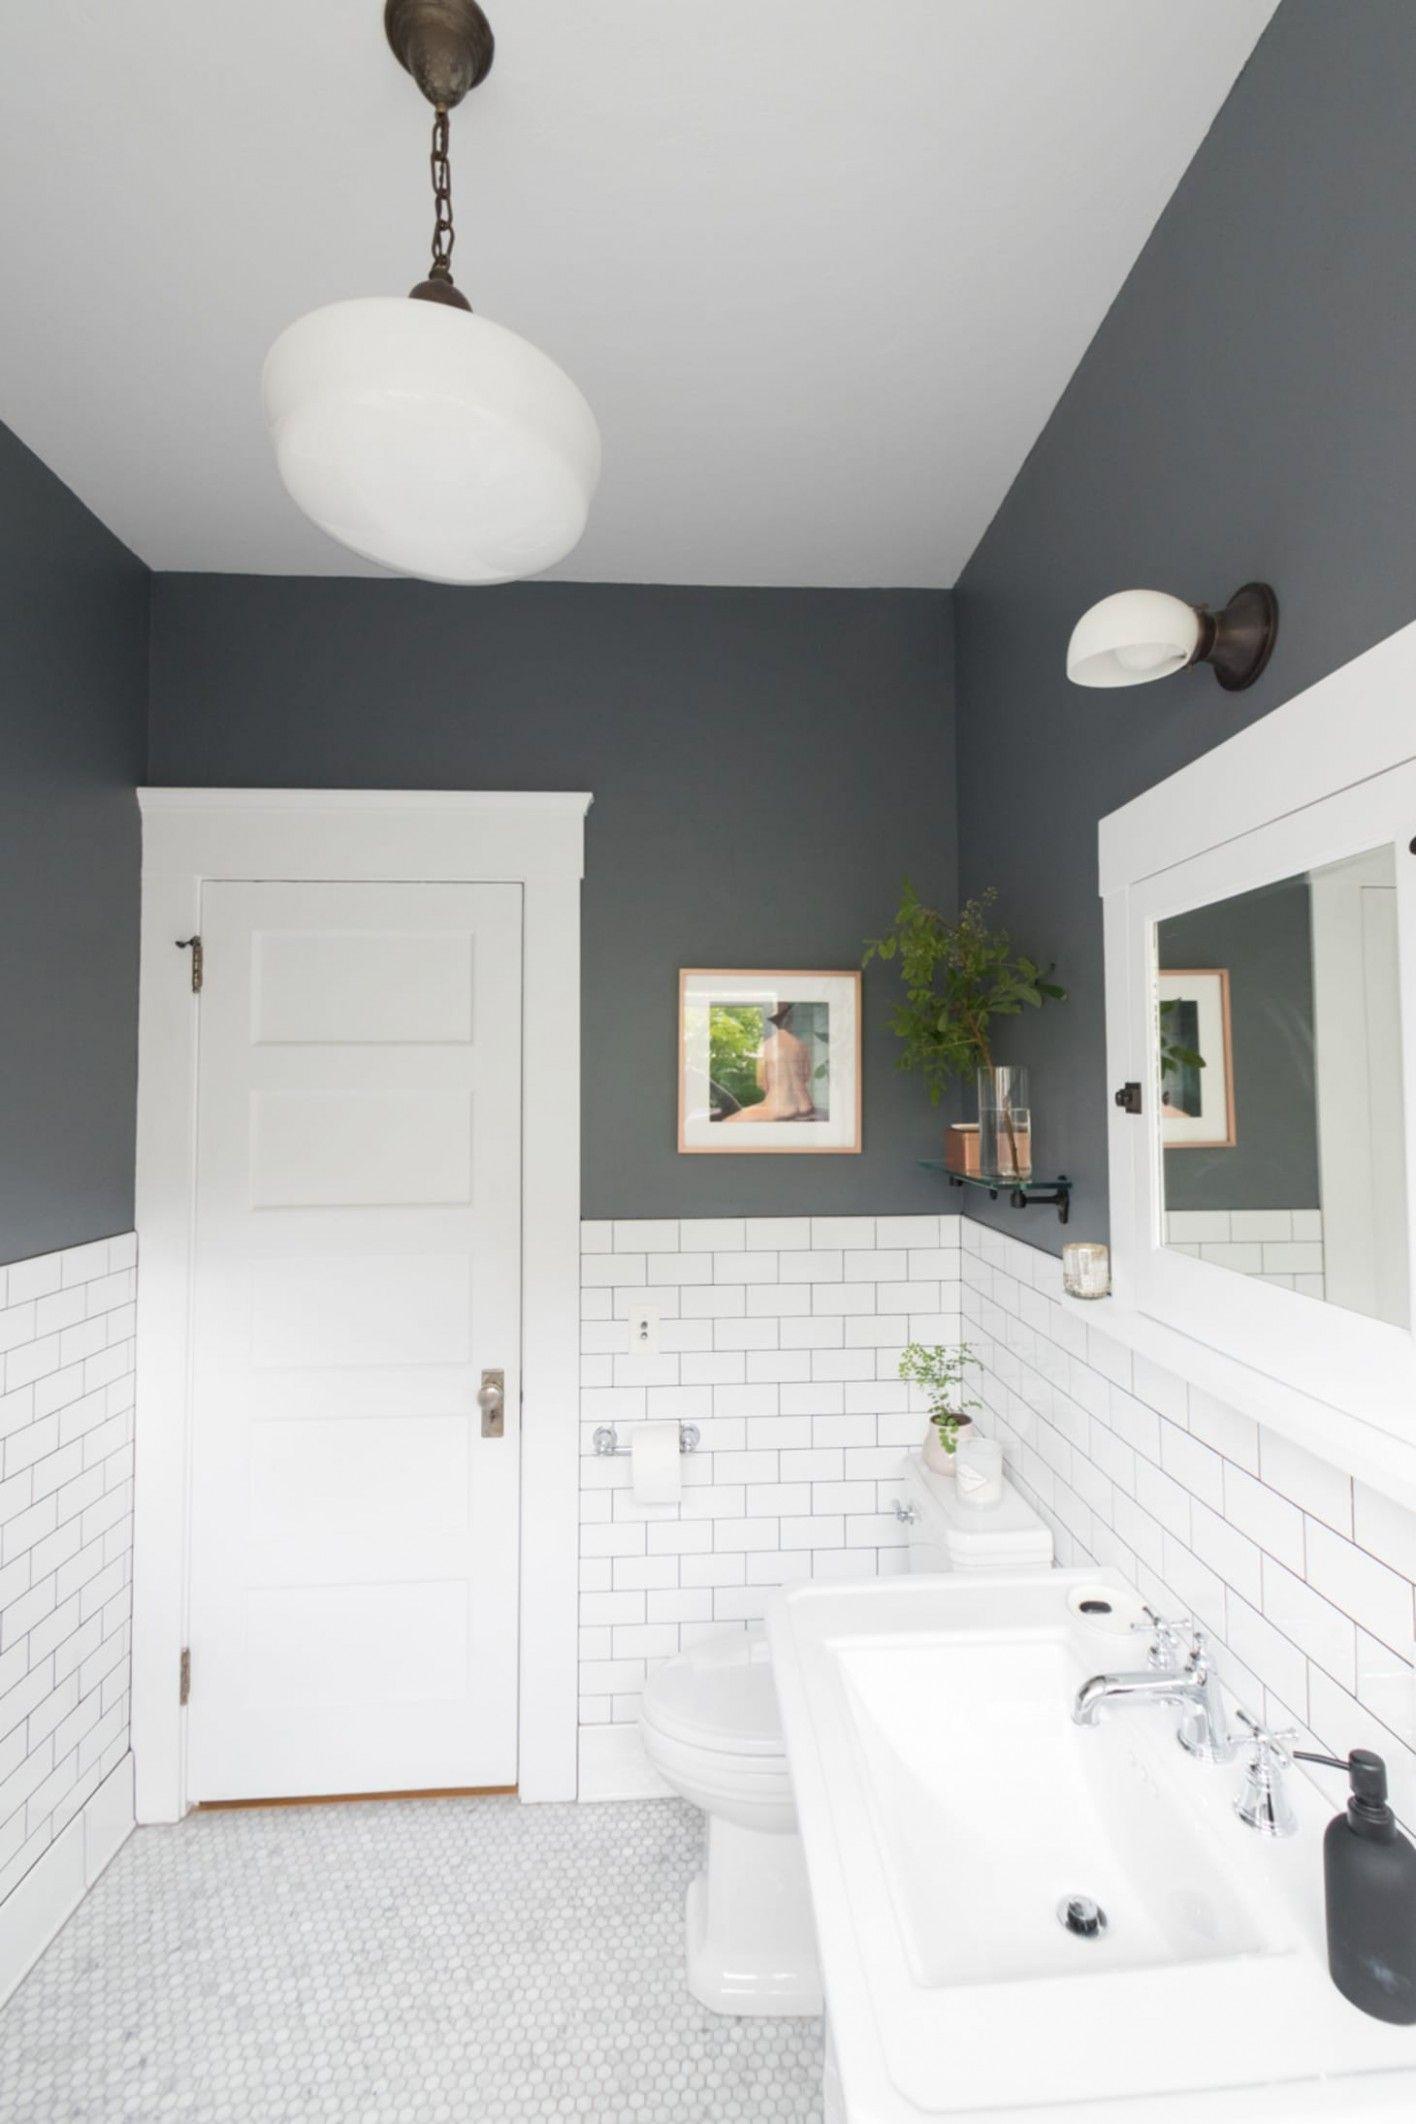 What Color To Paint En Suite Bathroom Di 2020 Desain Interior Kamar Mandi Interior Kamar Mandi Kamar Mandi Tradisional